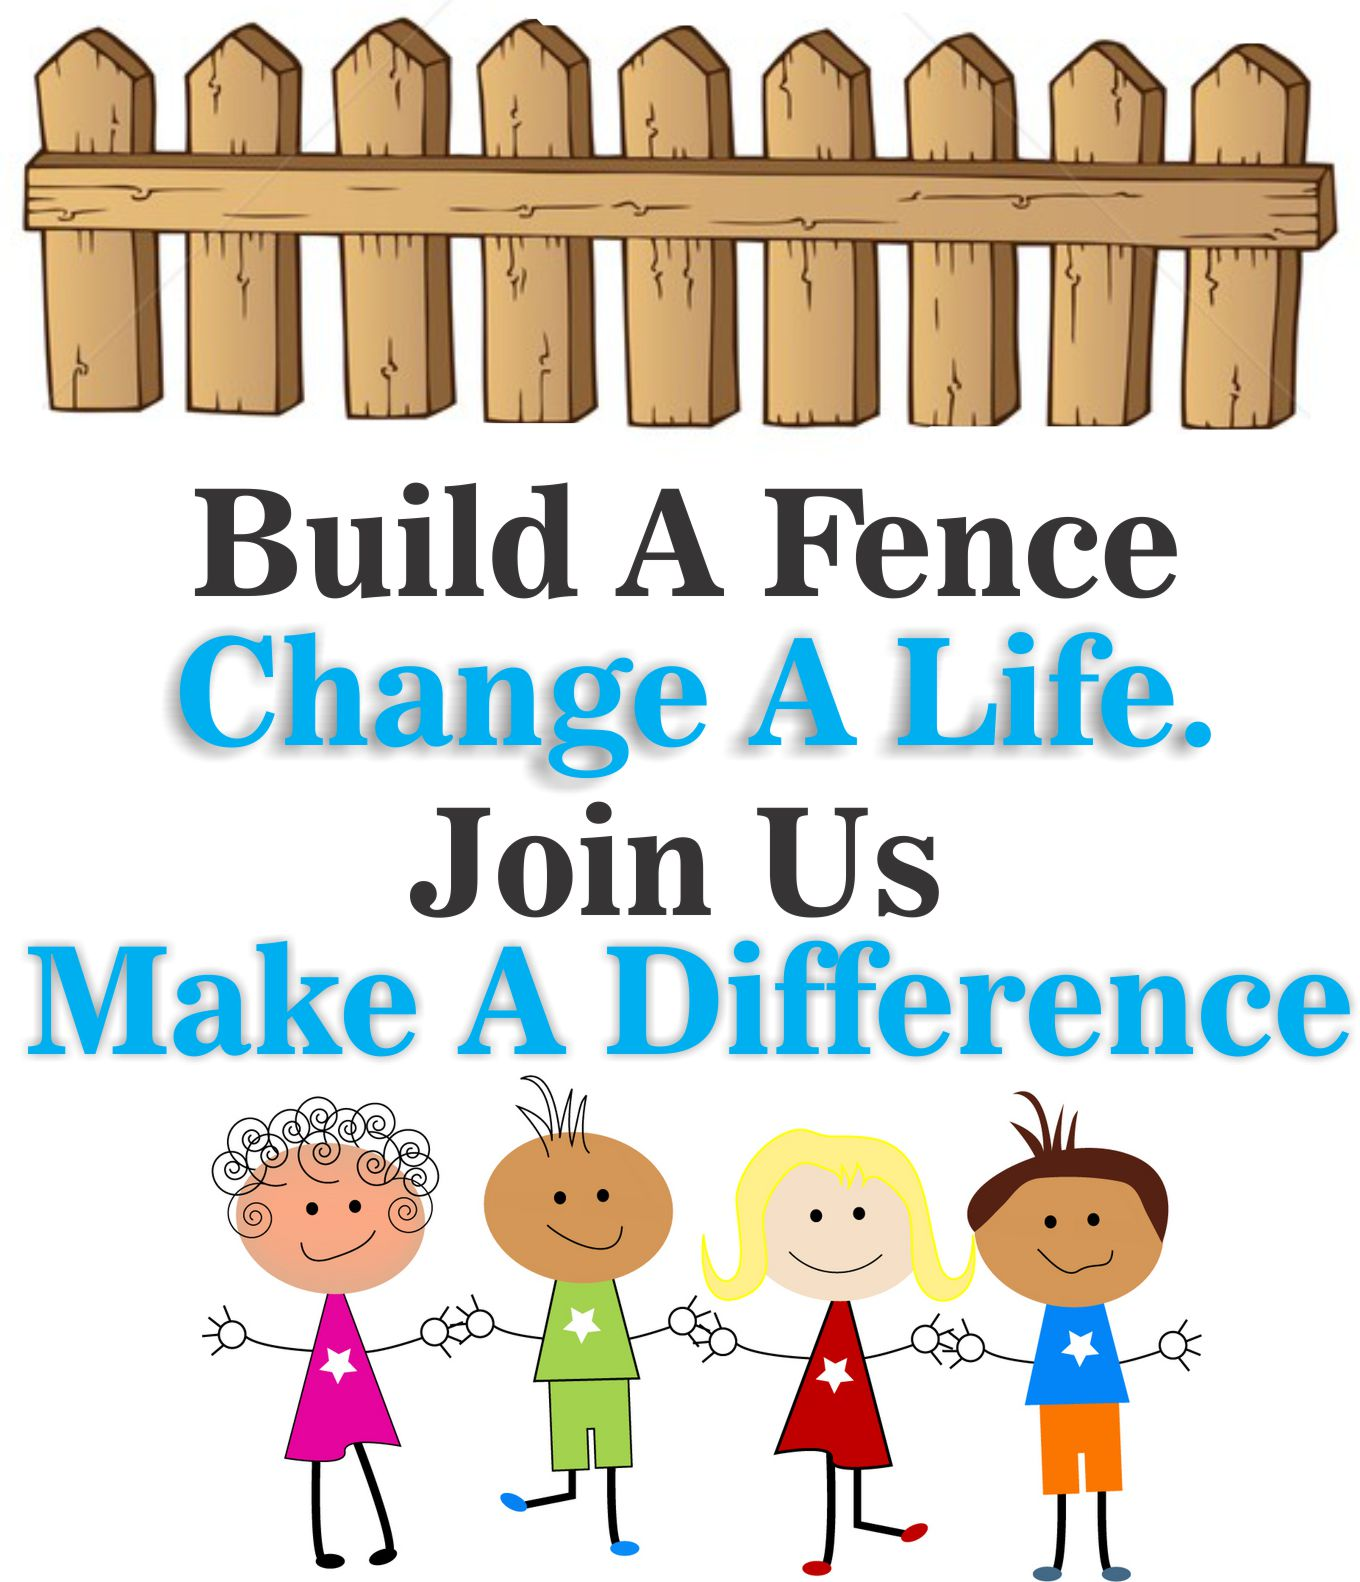 Build A Fence Change A Life - Nashville TN